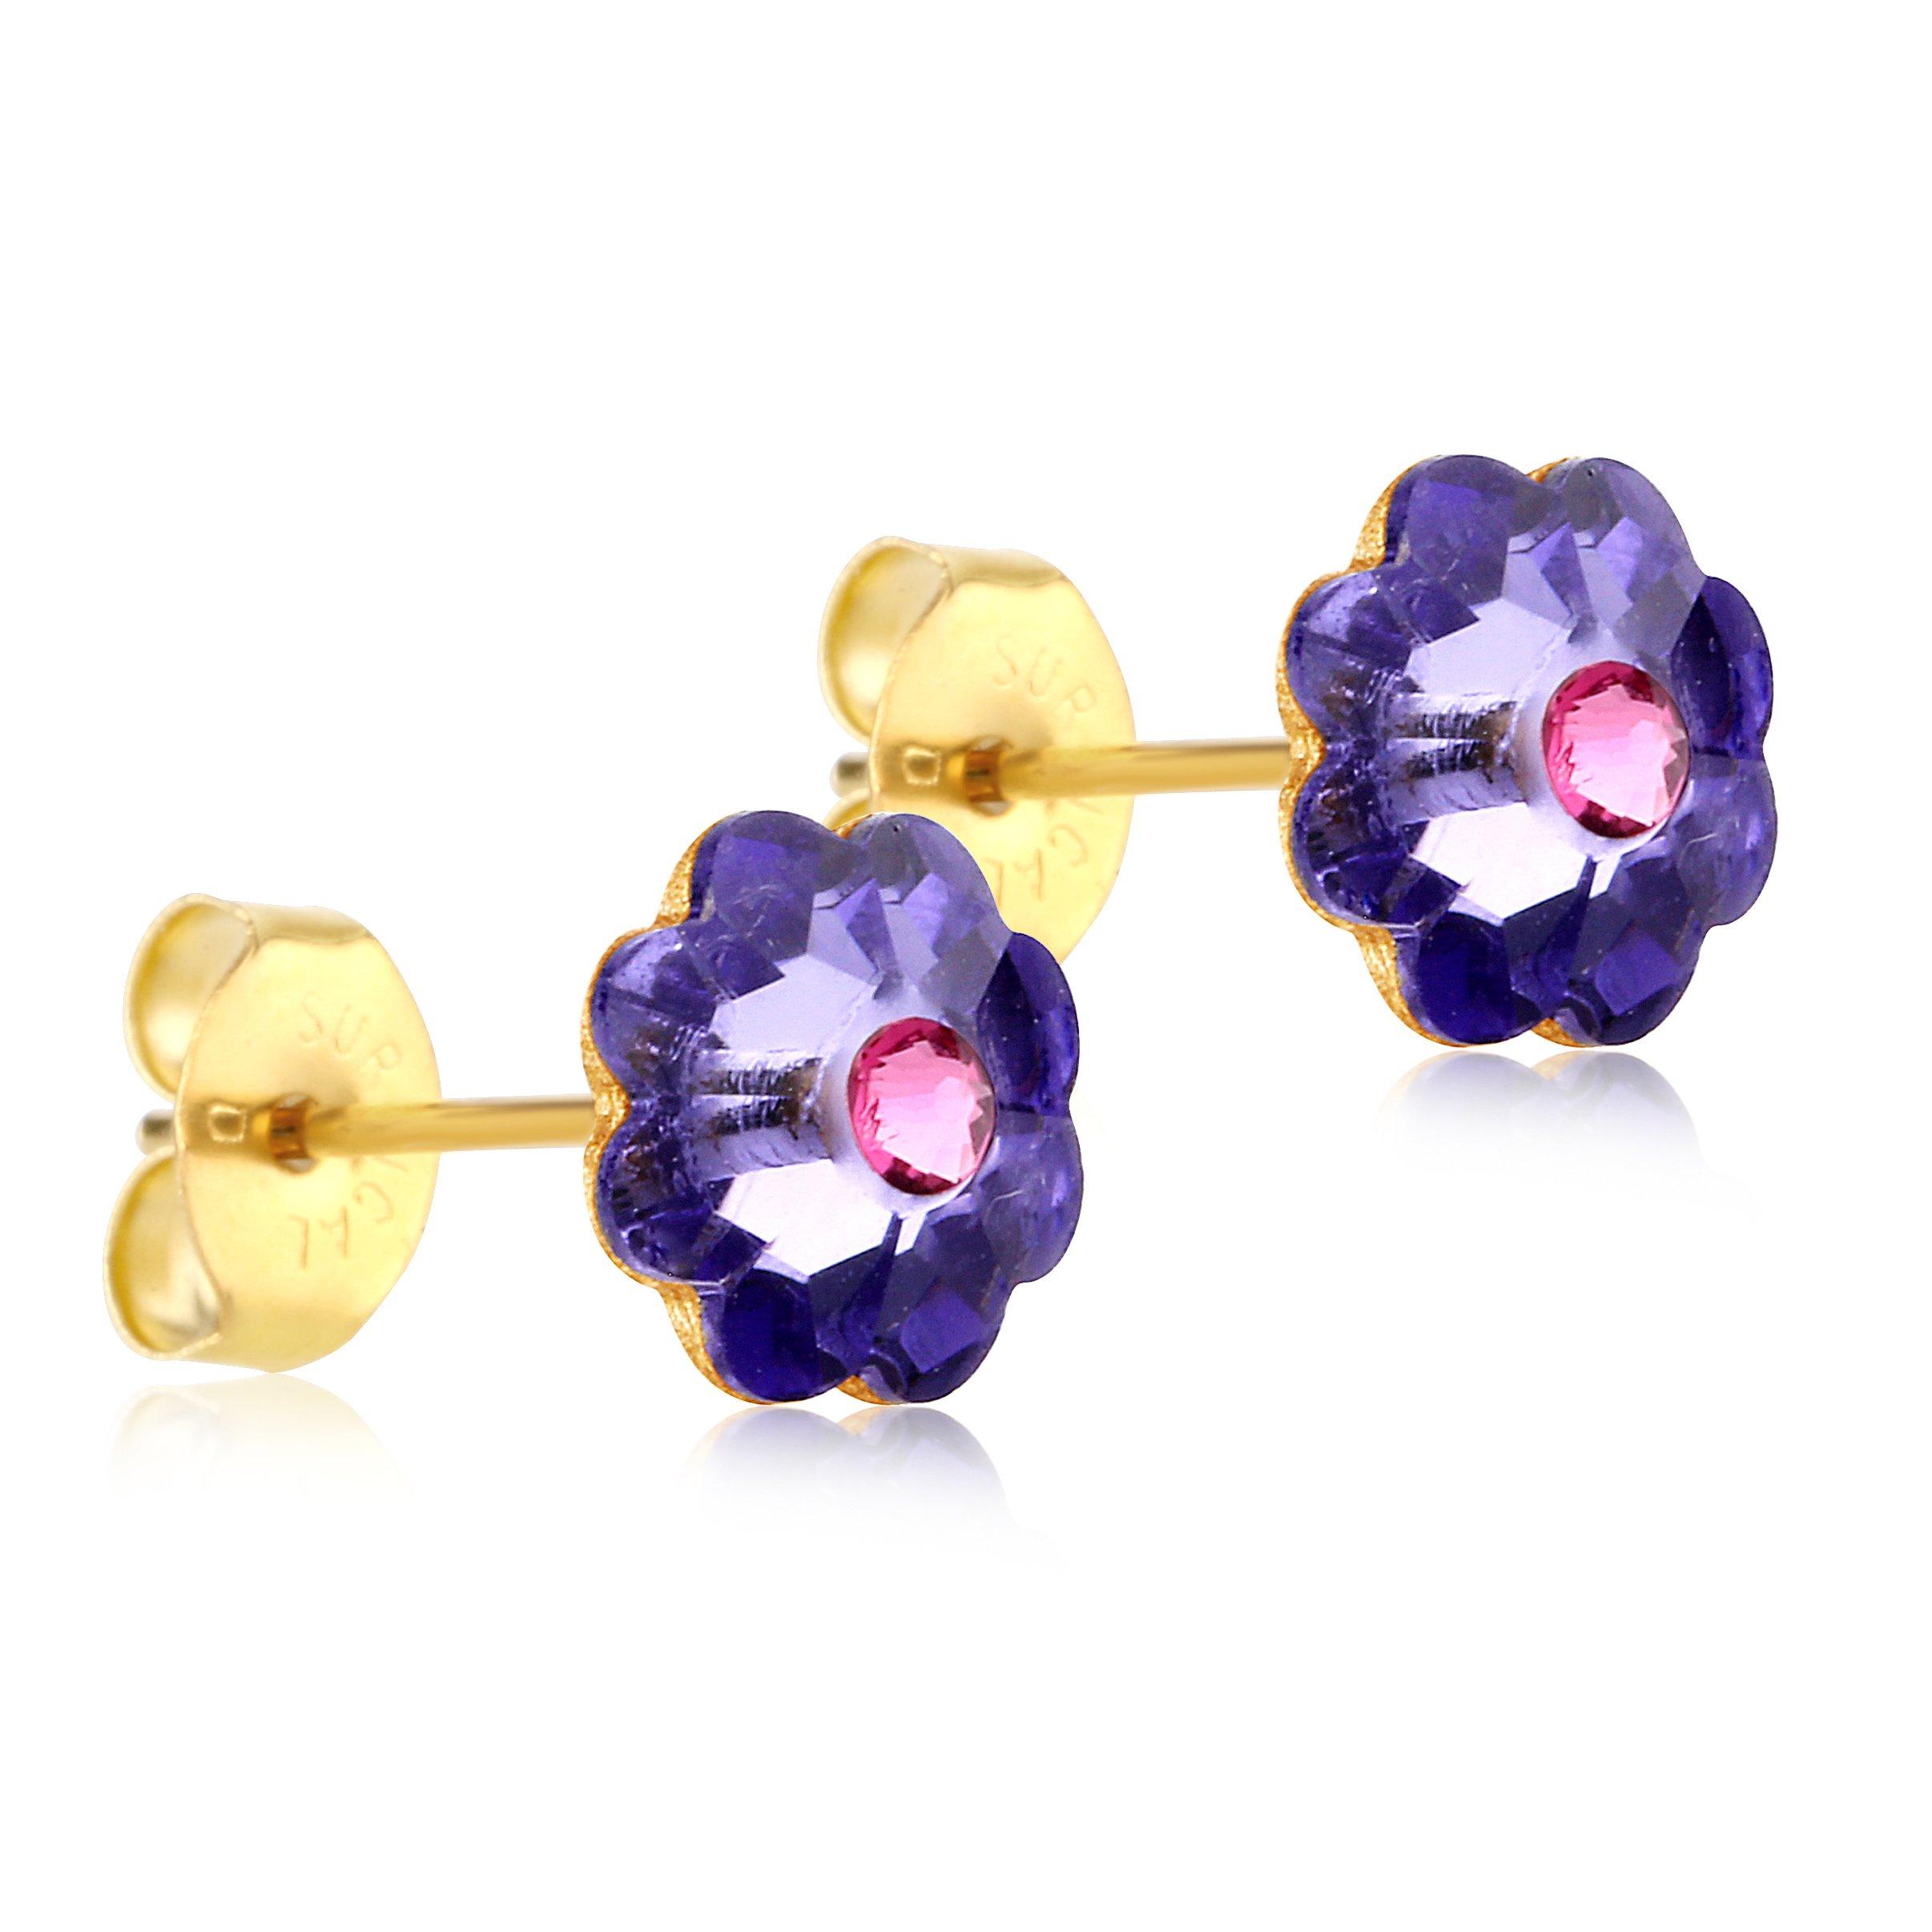 24K Gold Coated Stud Earrings with 8mm Purple Swarovski Crystal Flowers